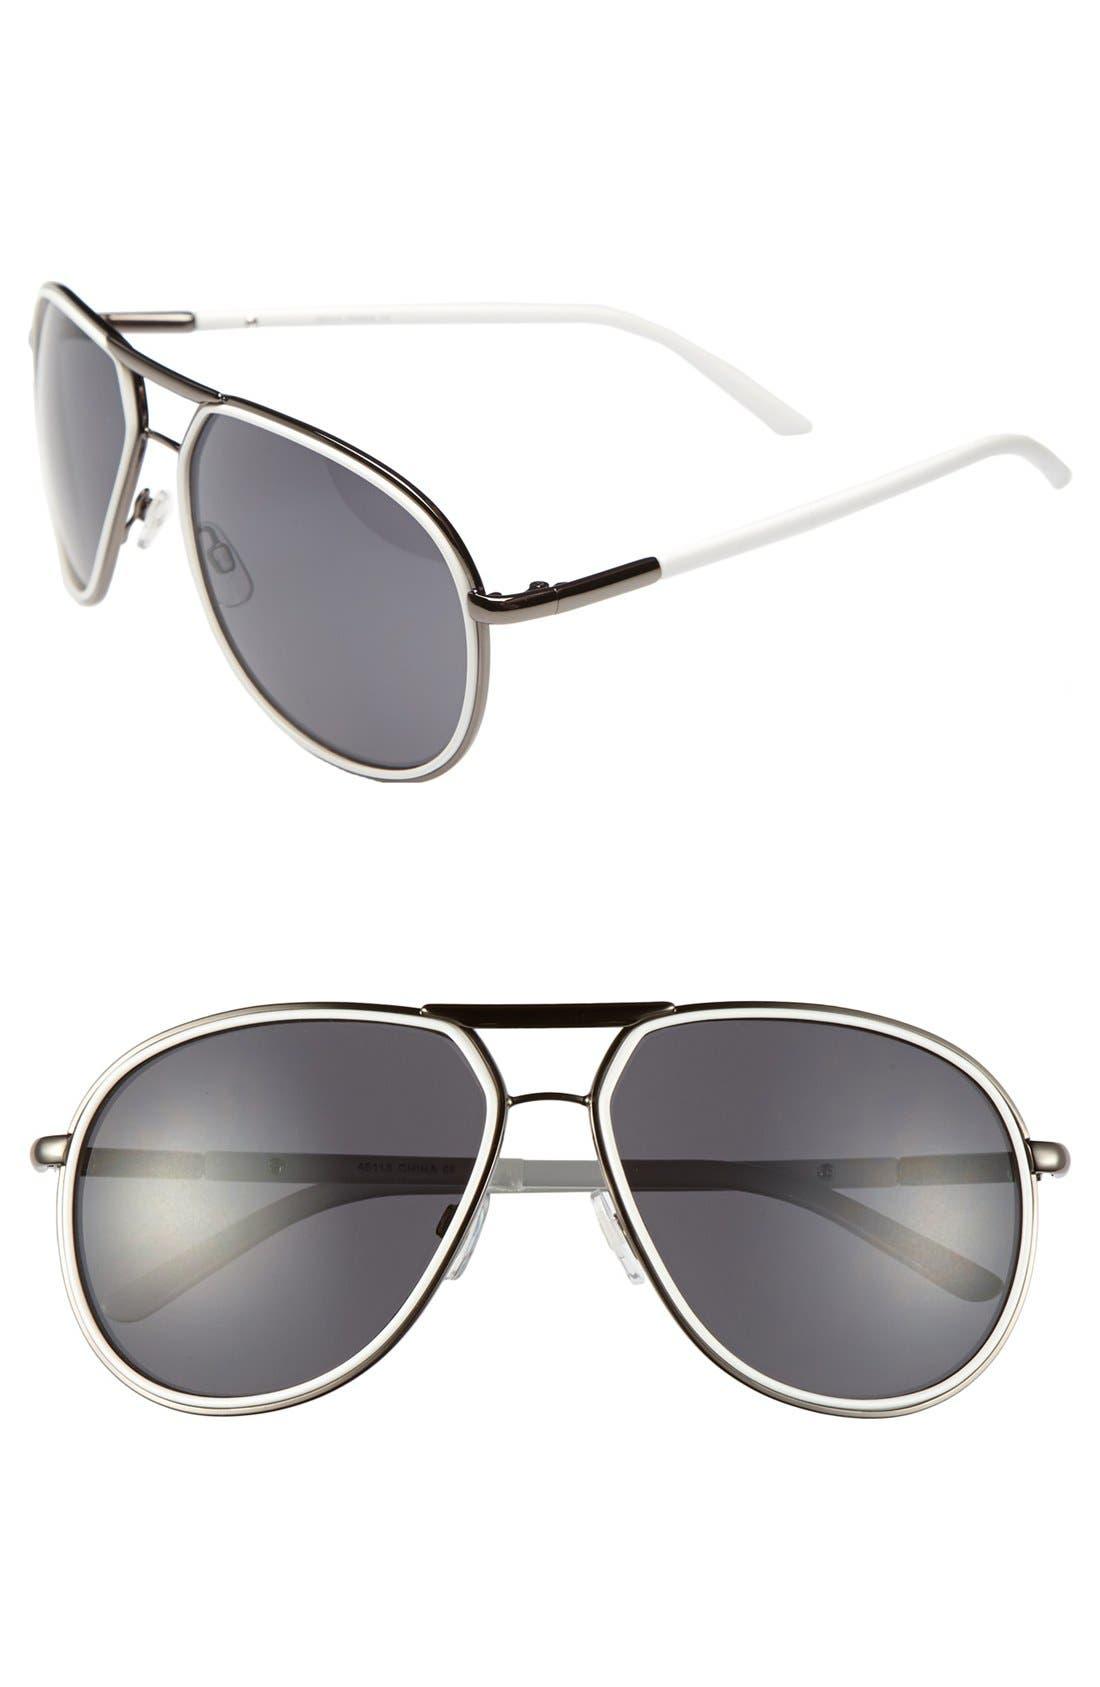 Main Image - A.J. Morgan 'Dream' Aviator Sunglasses